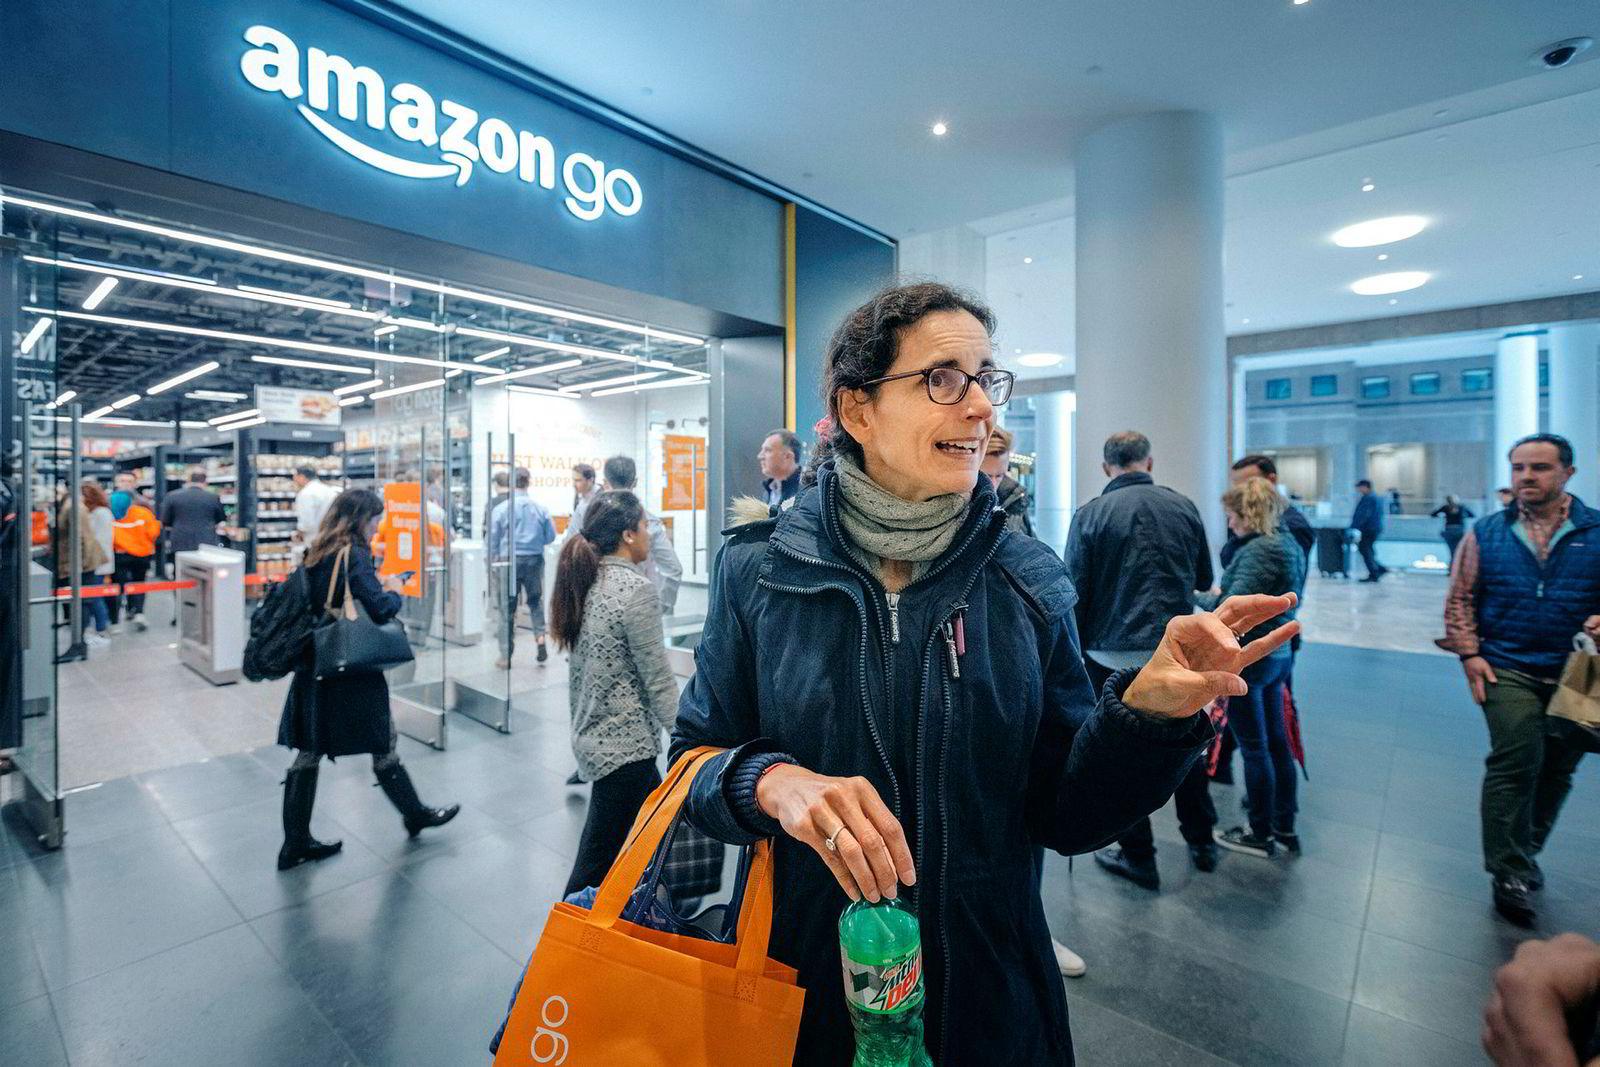 Stephanie Buret-Cruiziat utenfor AmazonGo butikken nede i Manhattans finansdistrikt.